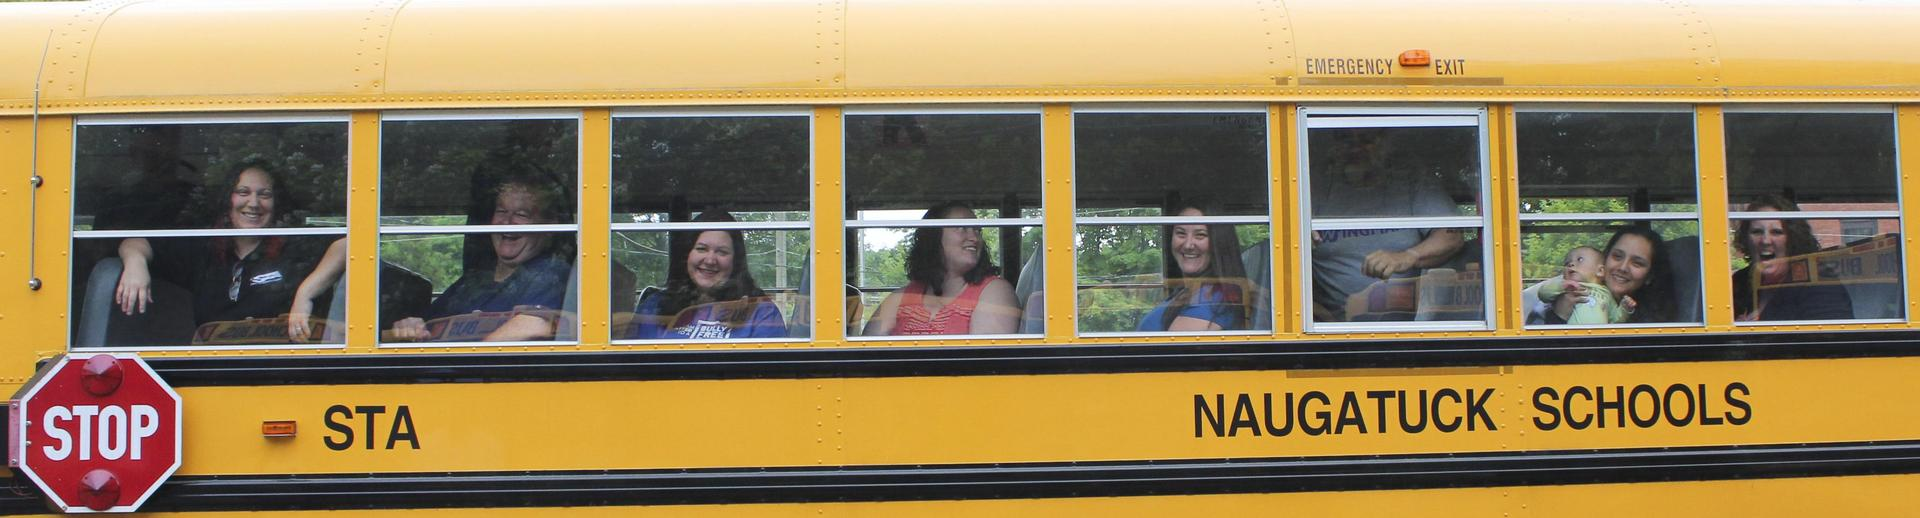 Bus drivers seen through window of bus